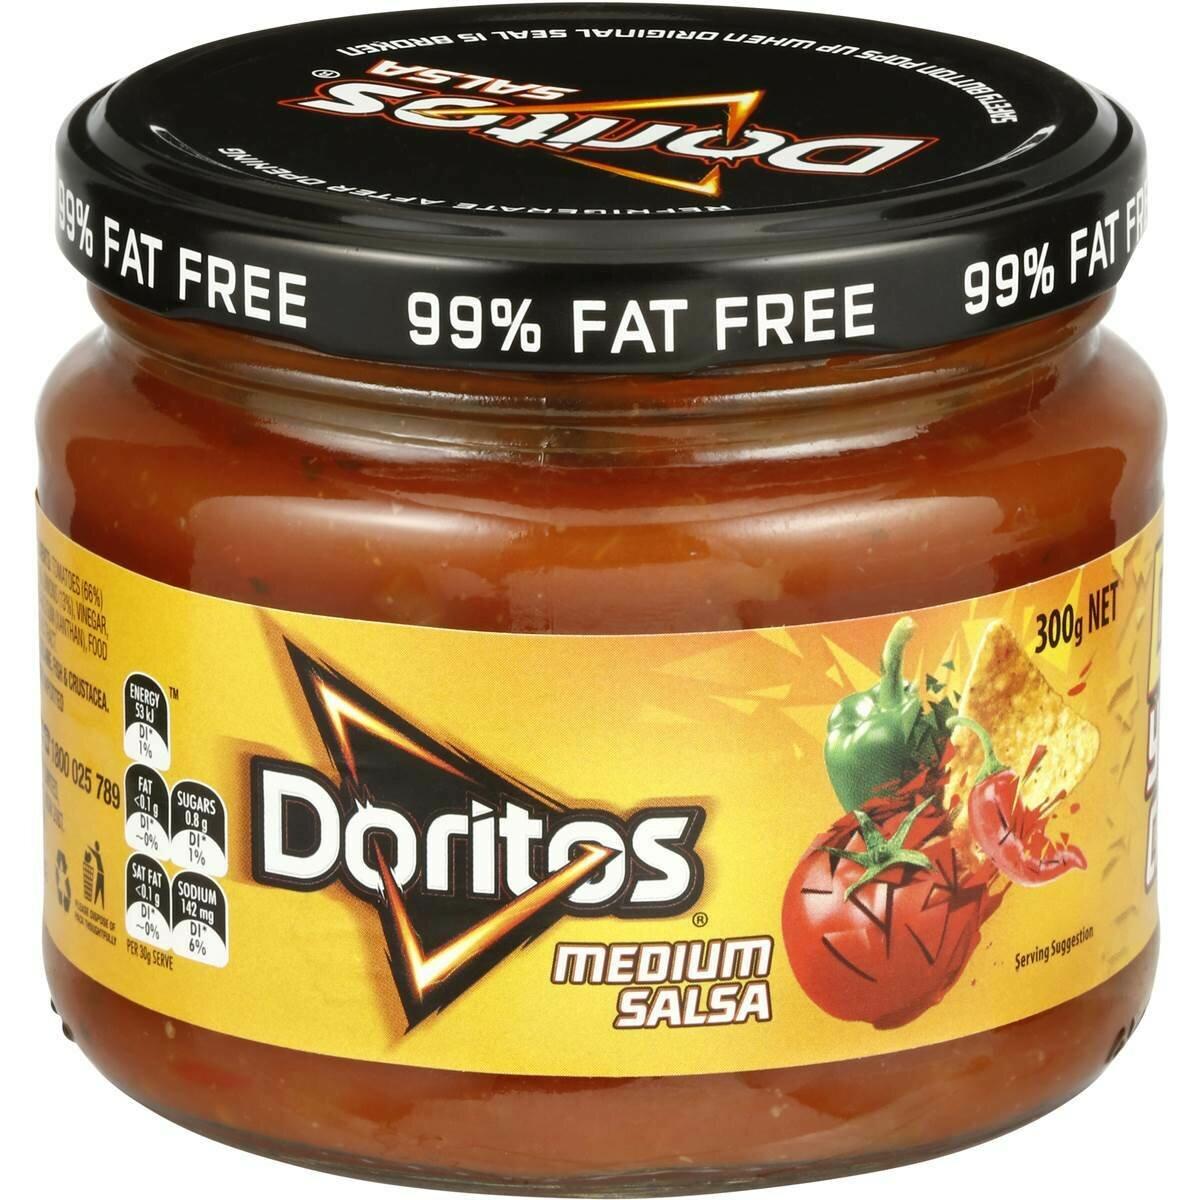 Doritos Salsa Medium 300g